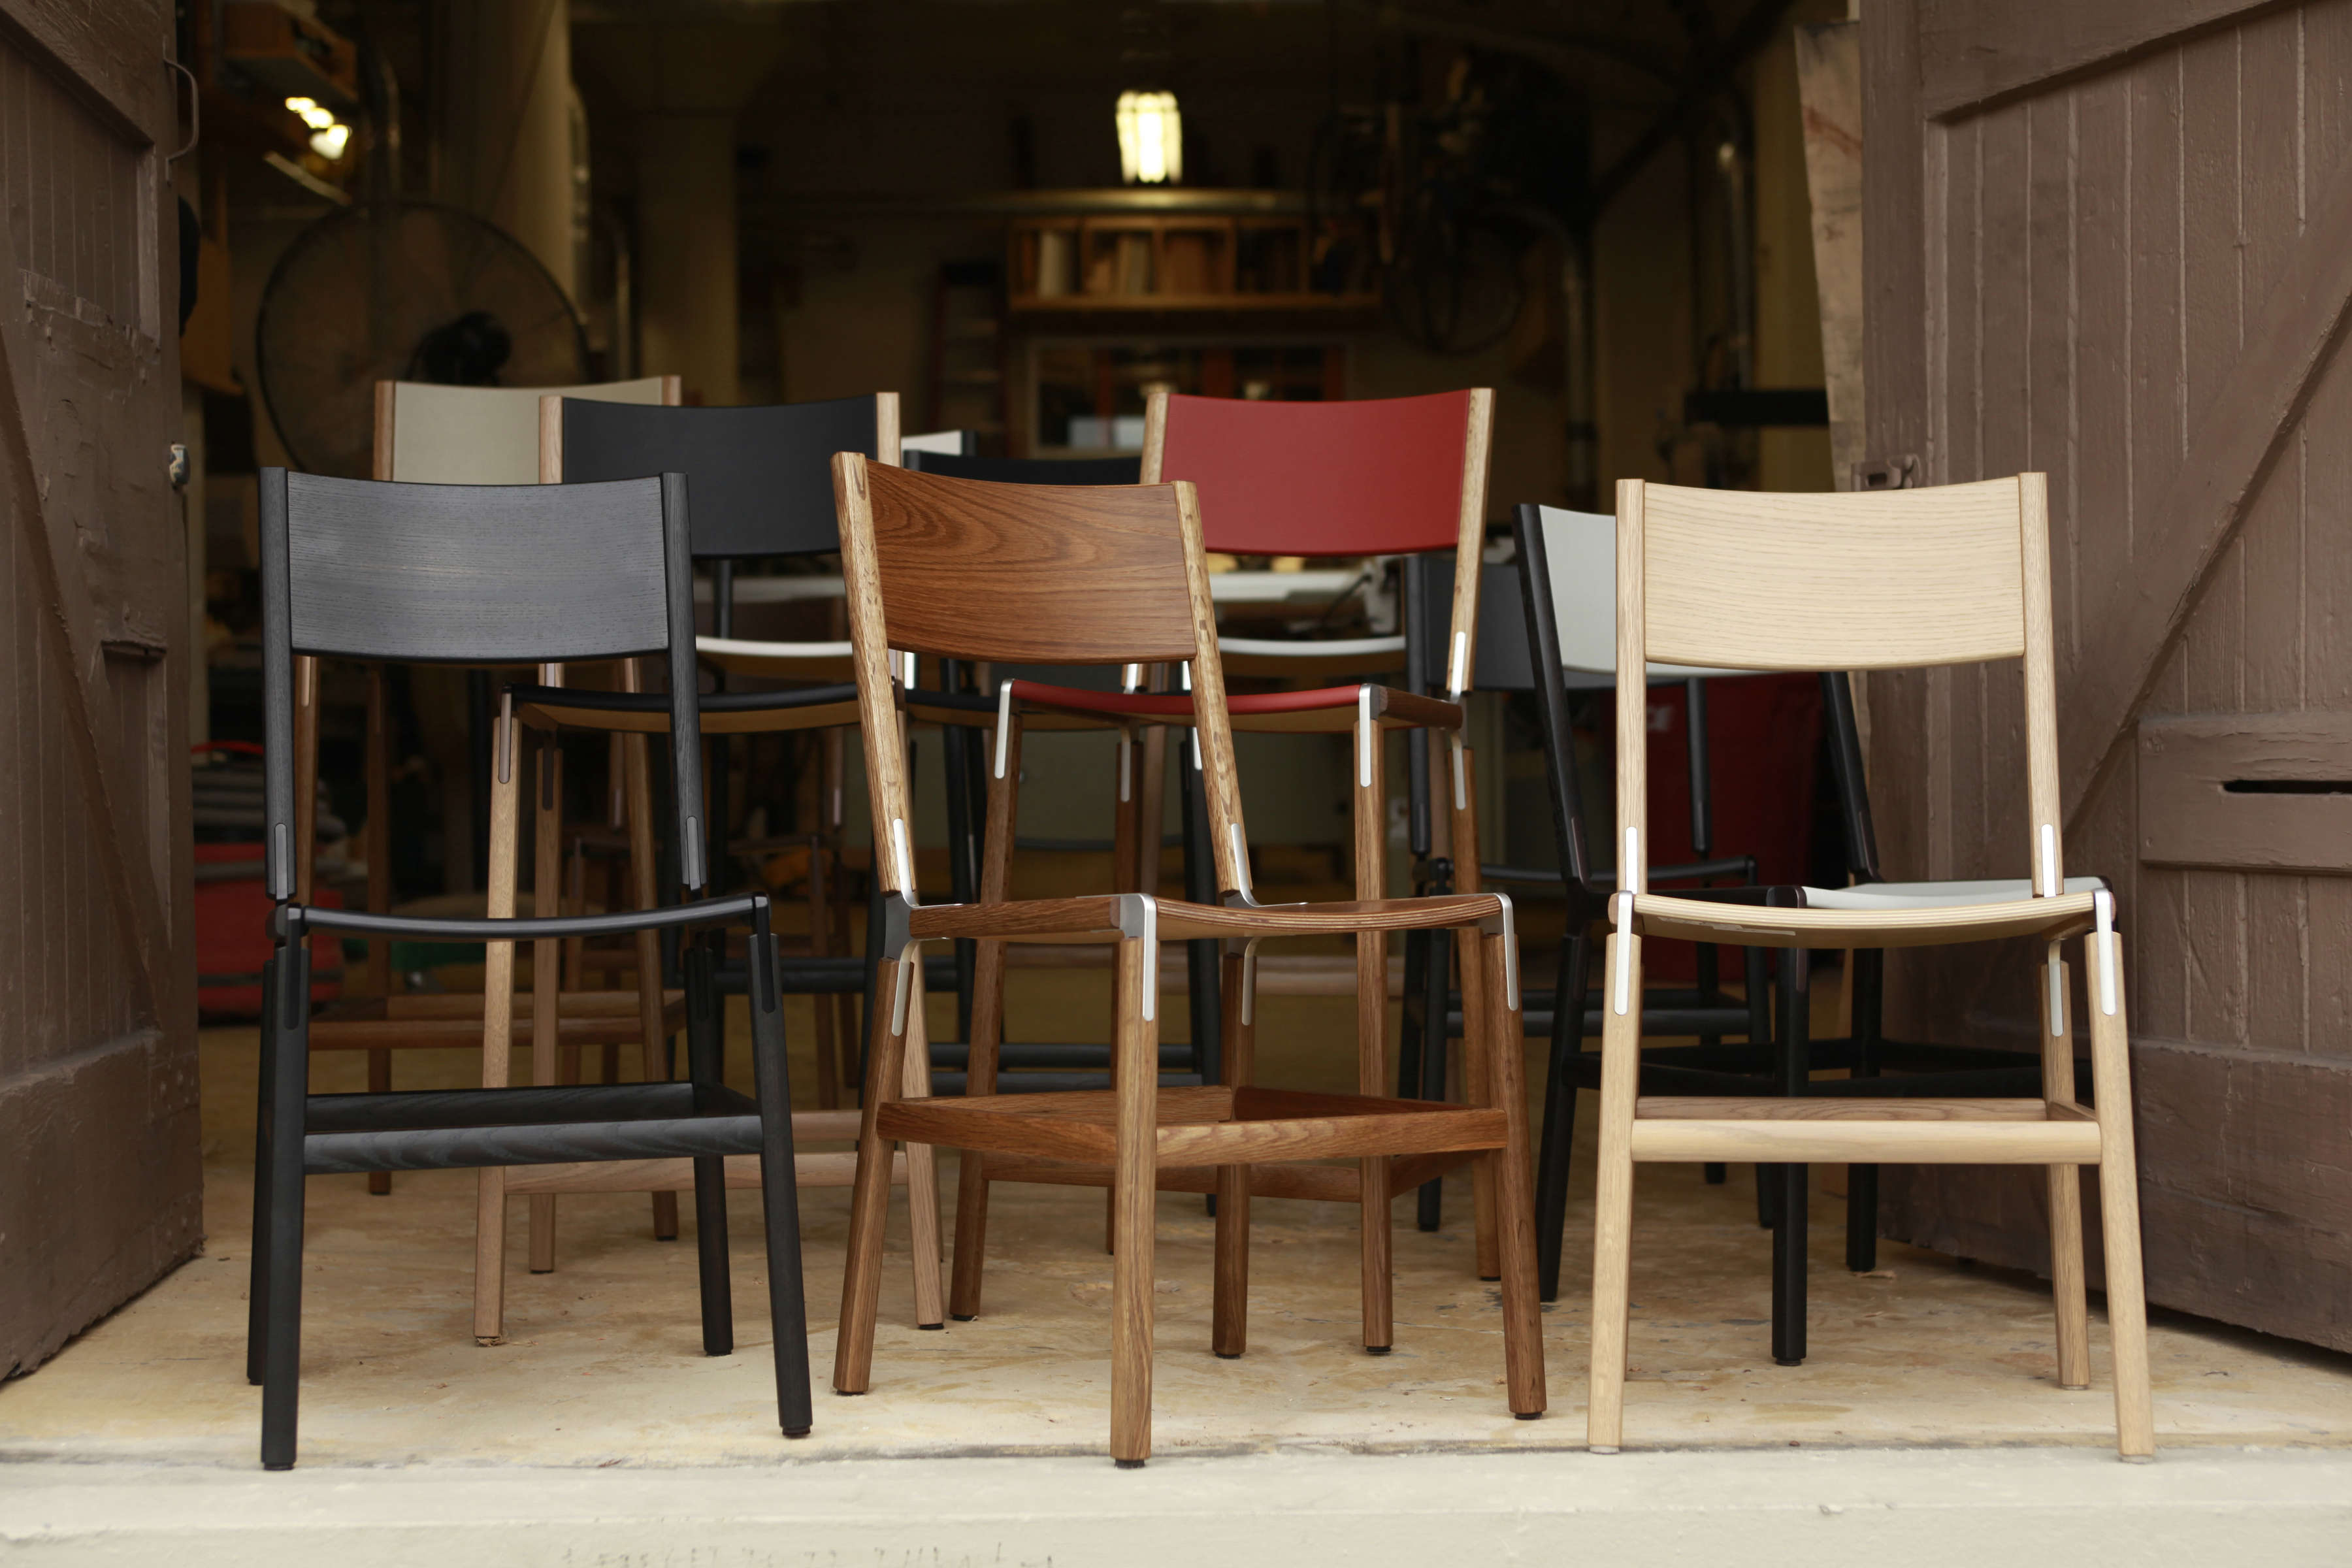 fyrn-flat-pack-wood-chairs